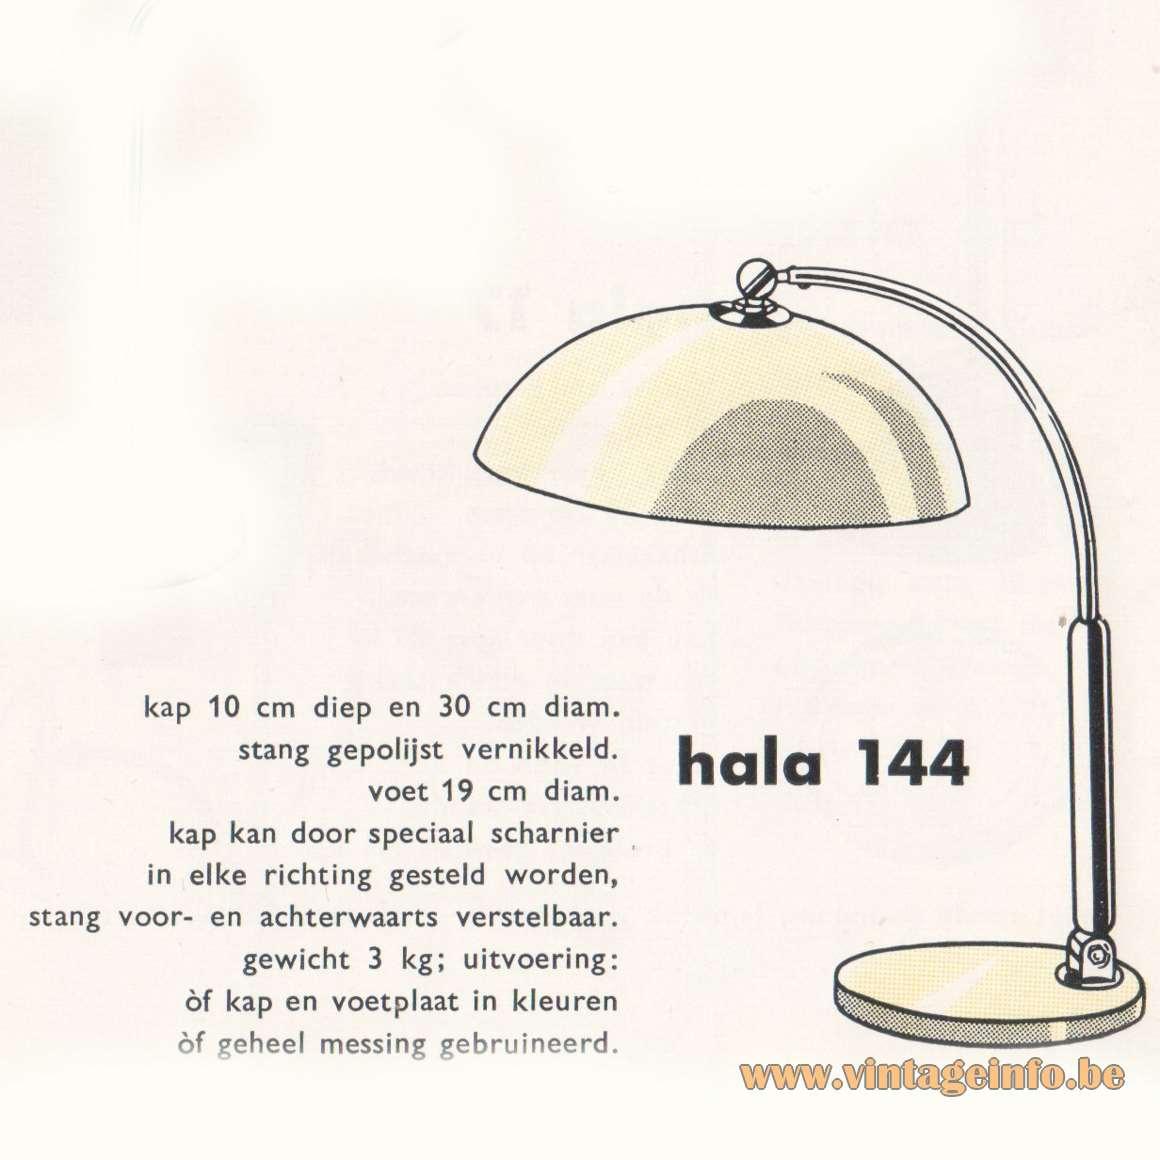 Hala 144 Desk Lamp - Catalogue 1959